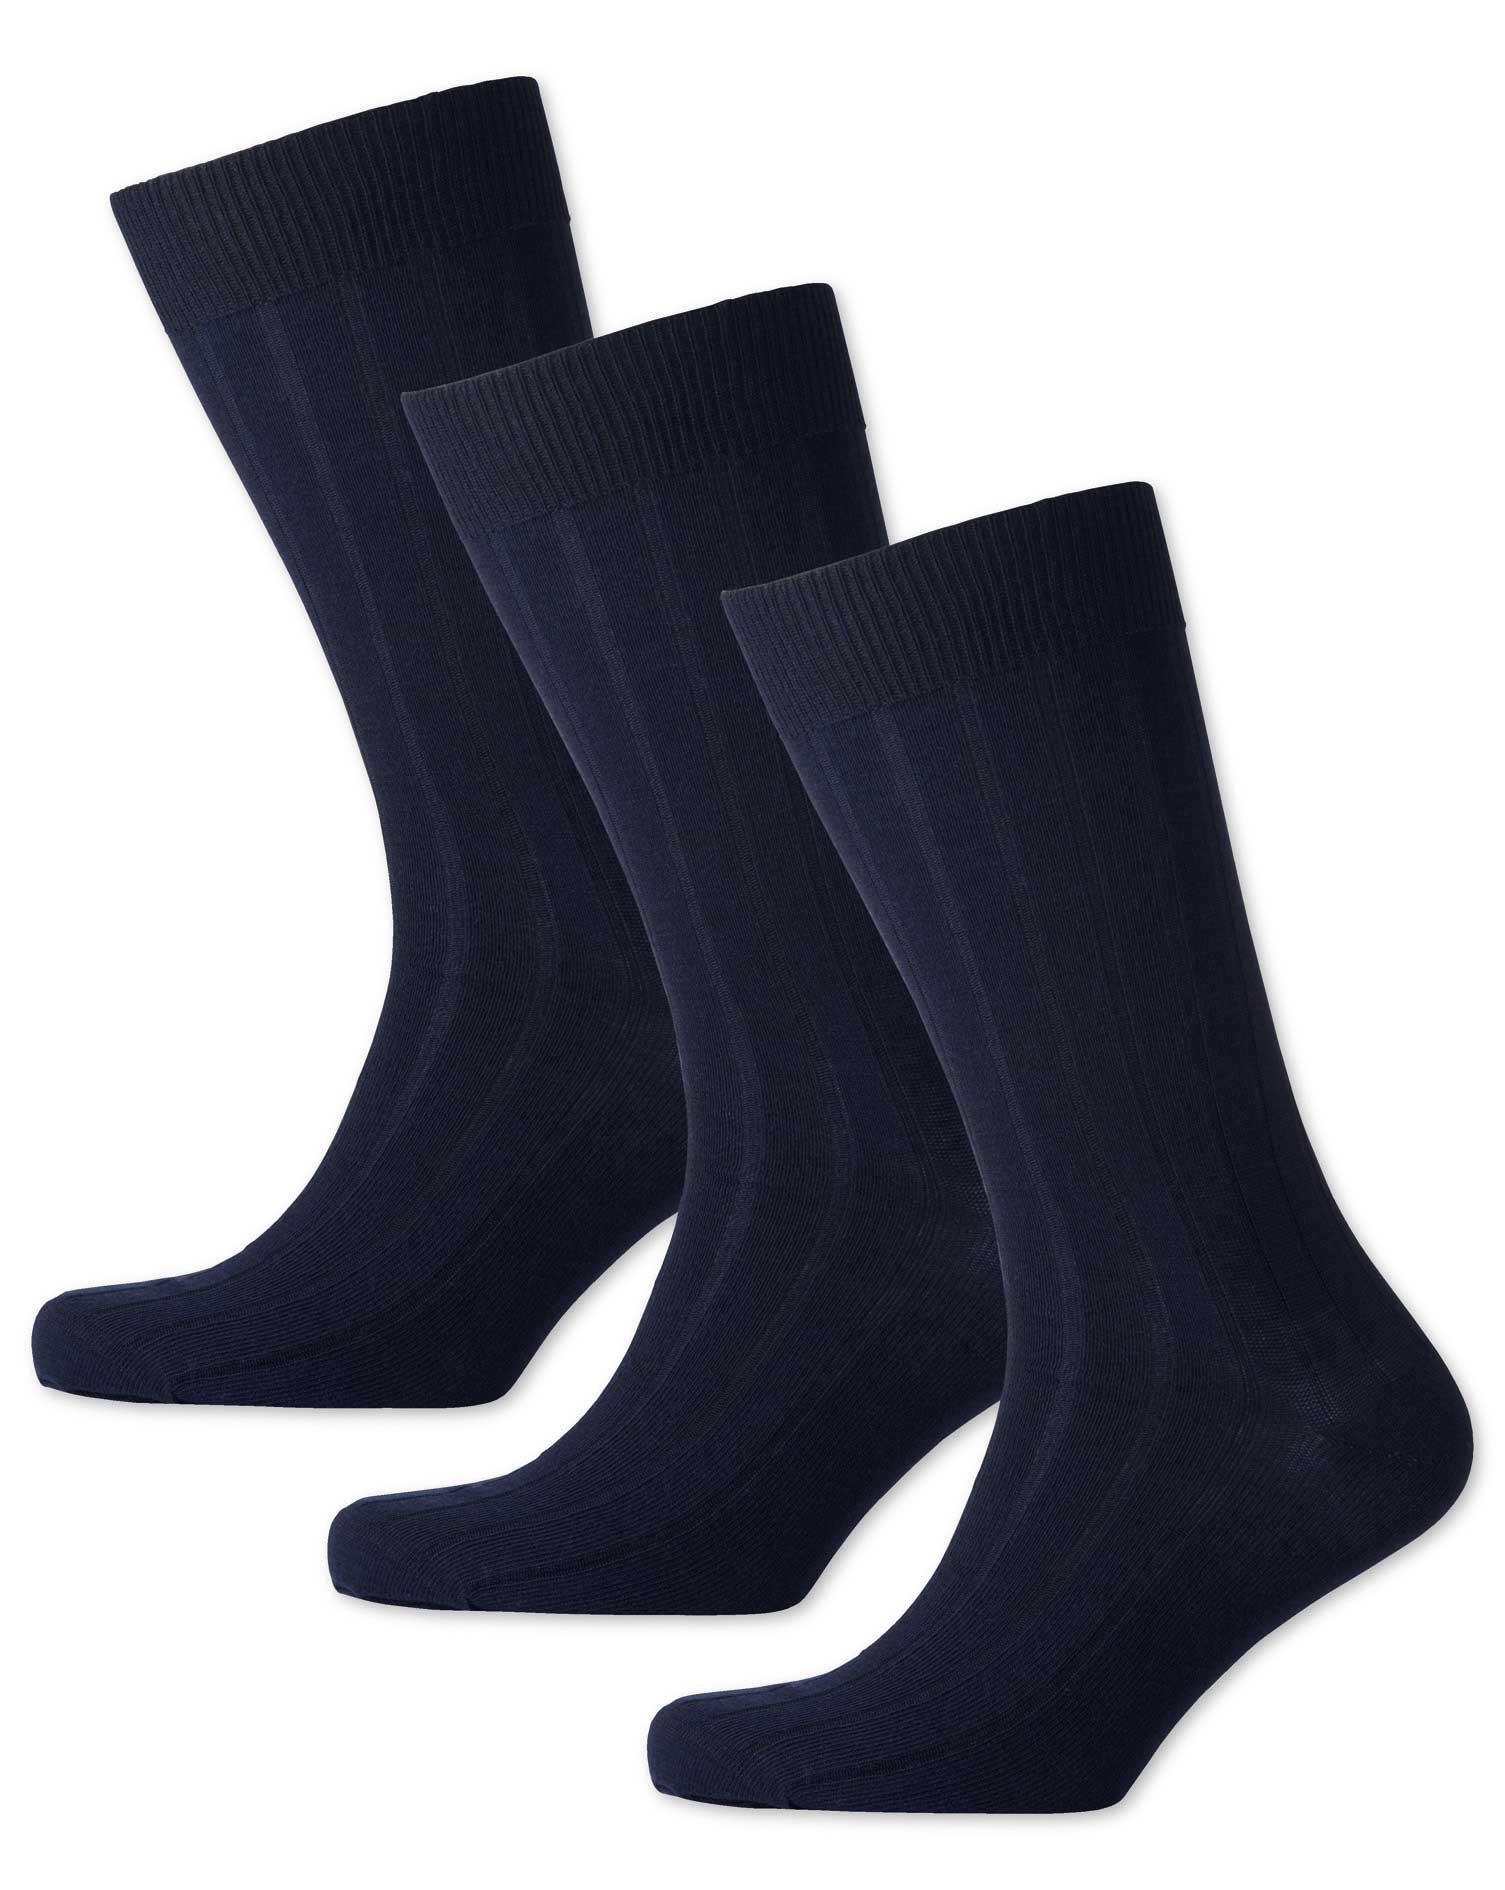 Navy Wool Rich 3 Pack Socks Size Large by Charles Tyrwhitt